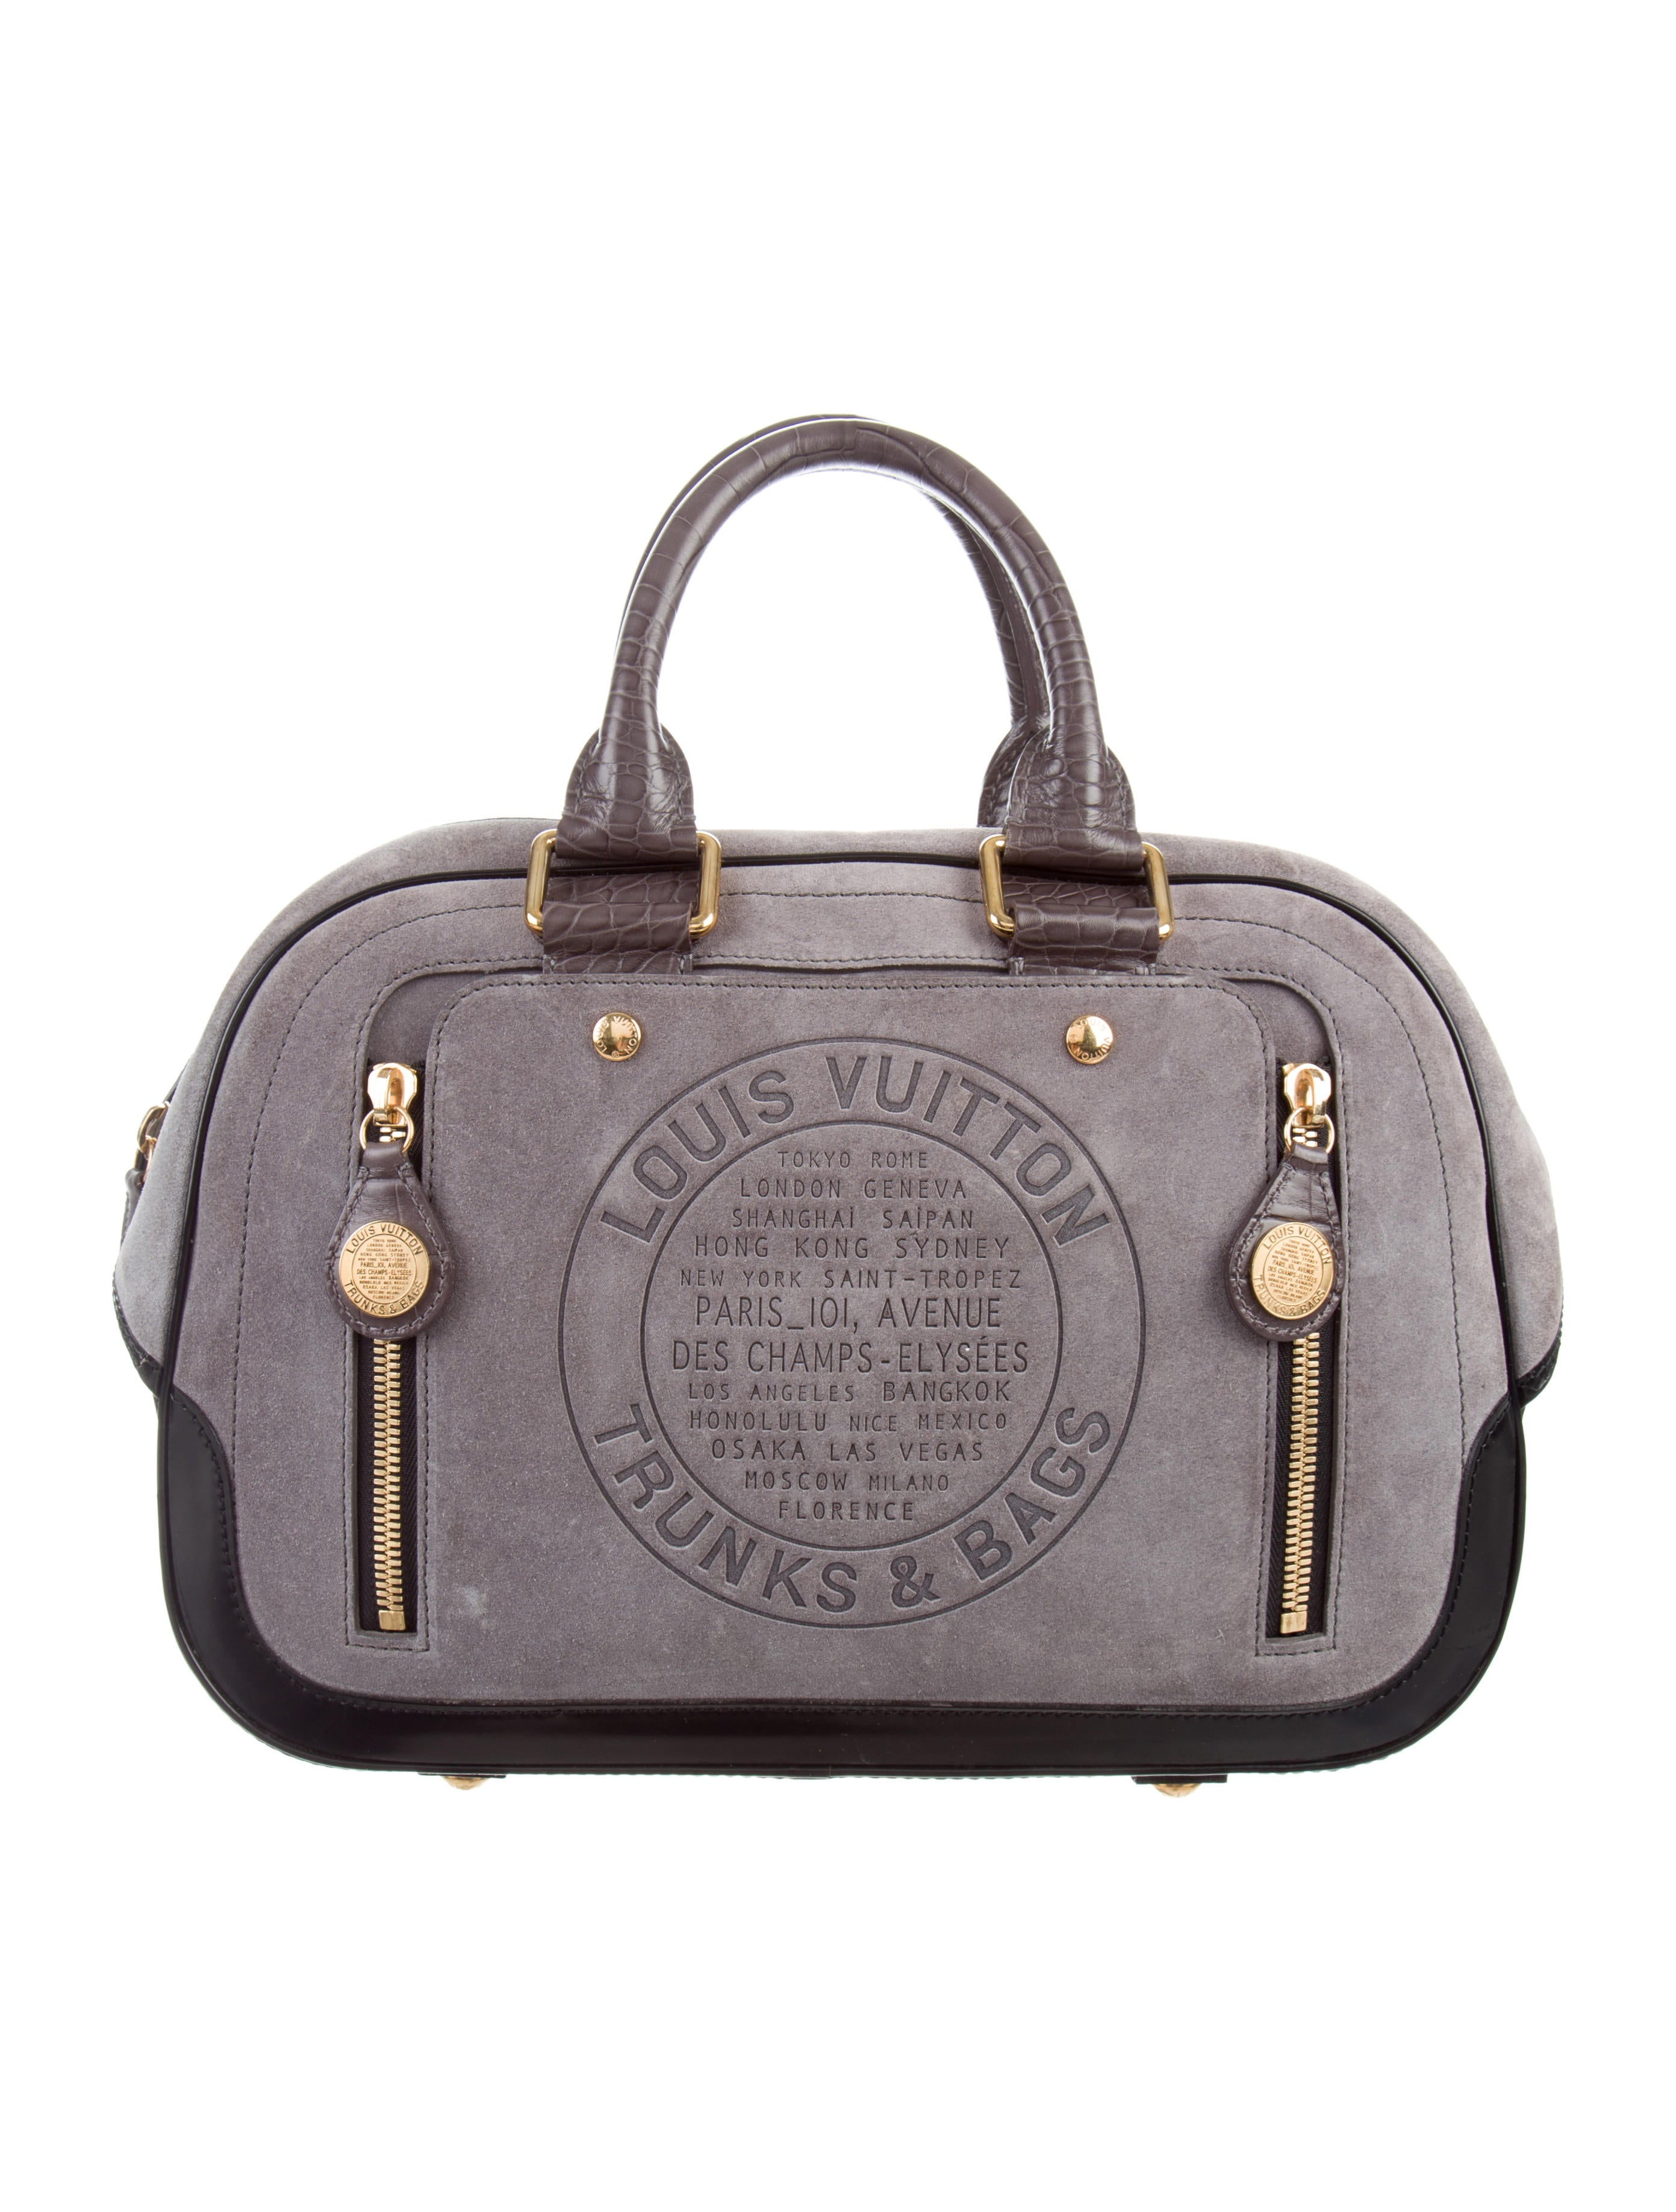 Luxury Consignment S For Pre Owned Designer Handbags Las